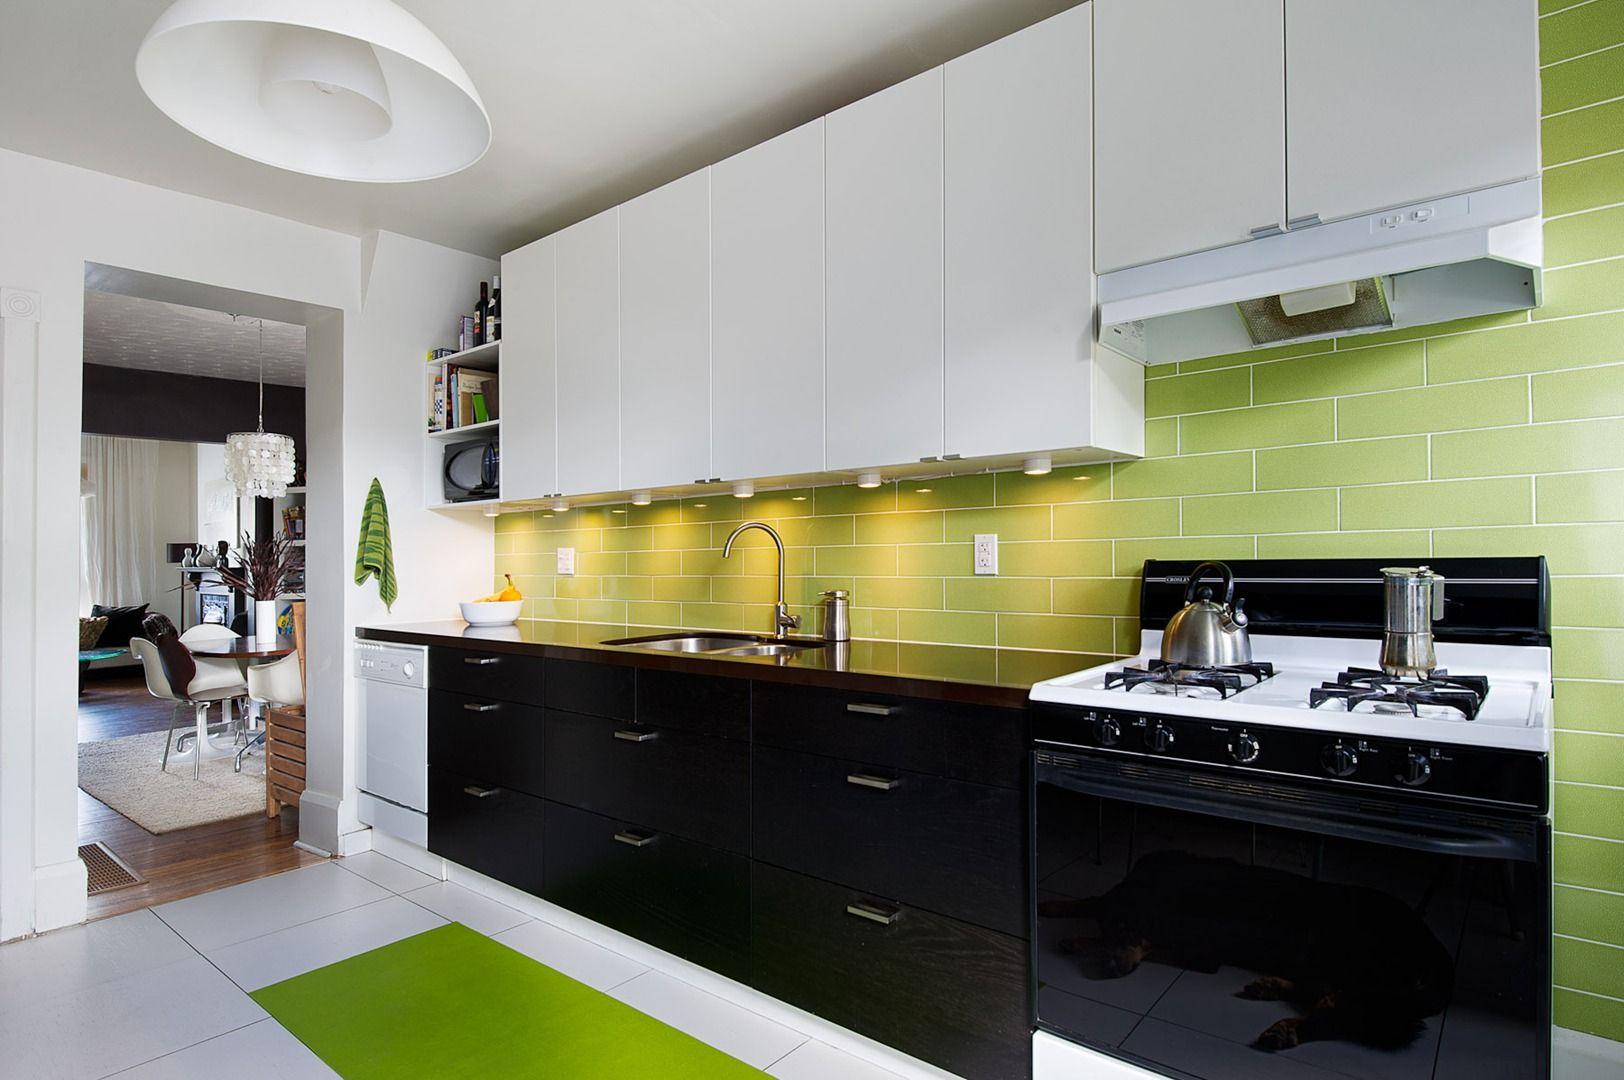 Choosing Best Kitchen Tile Ideas. Green backsplash and floor theme contributes to the optimistic kitchen design